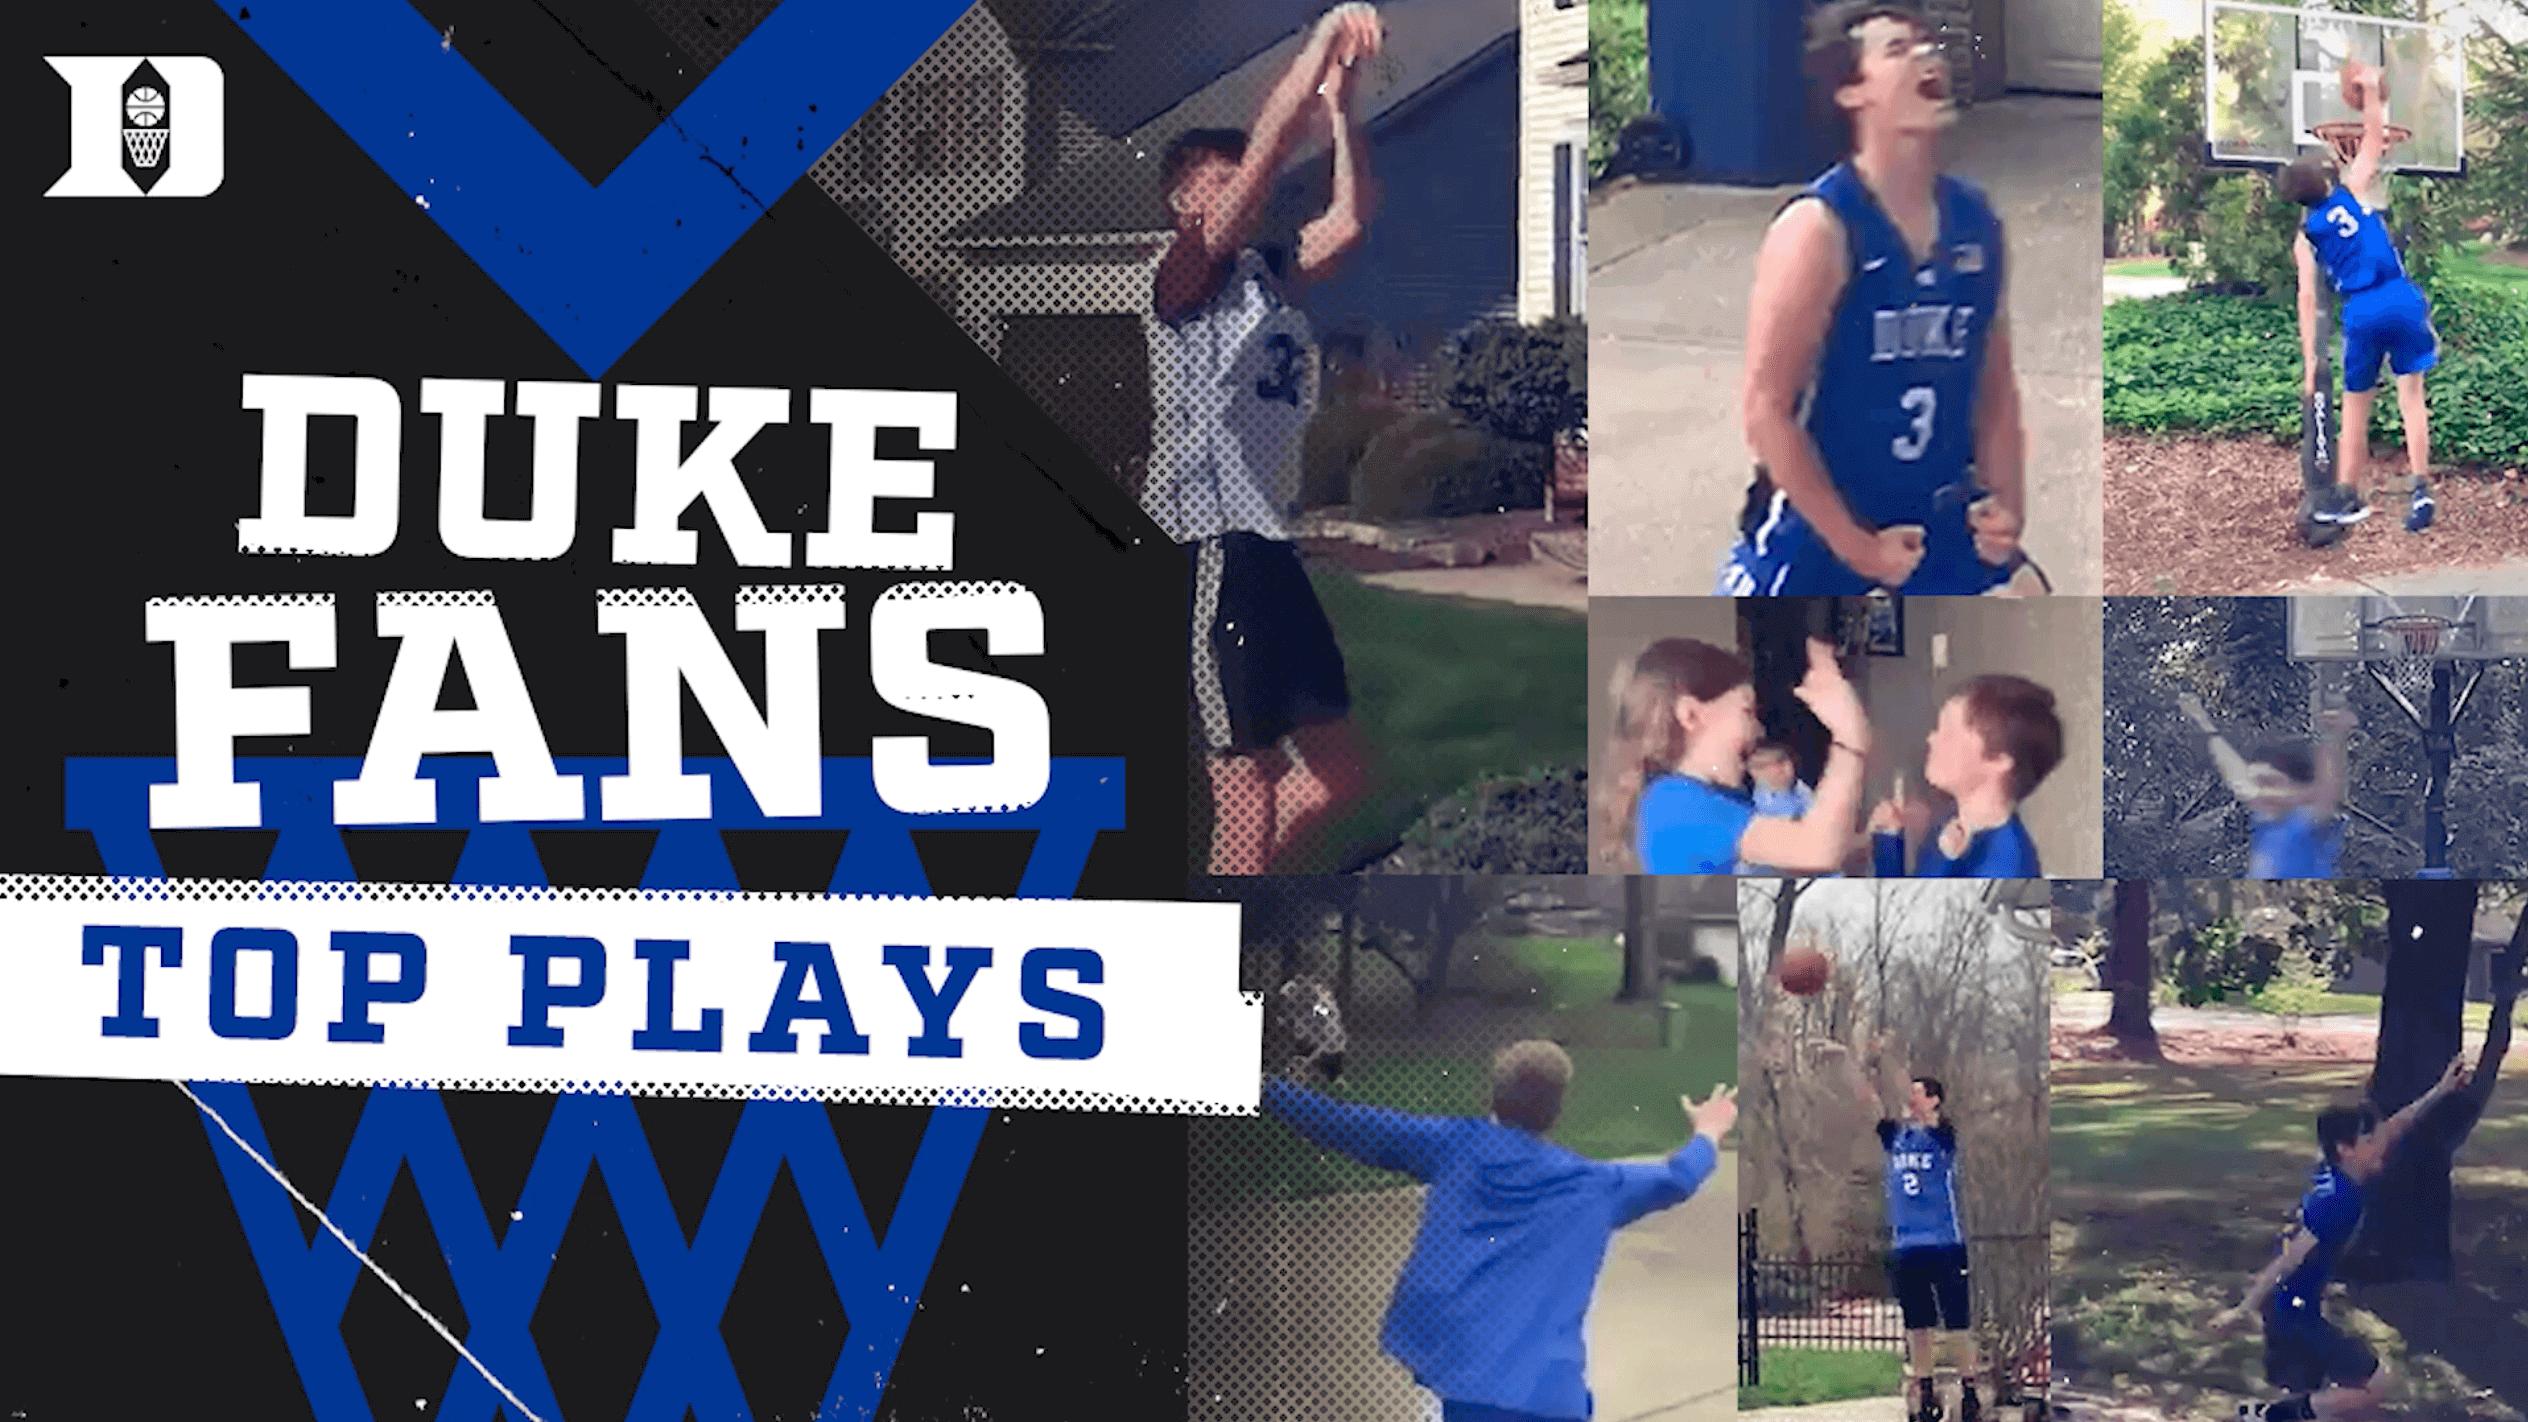 Duke Fans Top Plays Remake